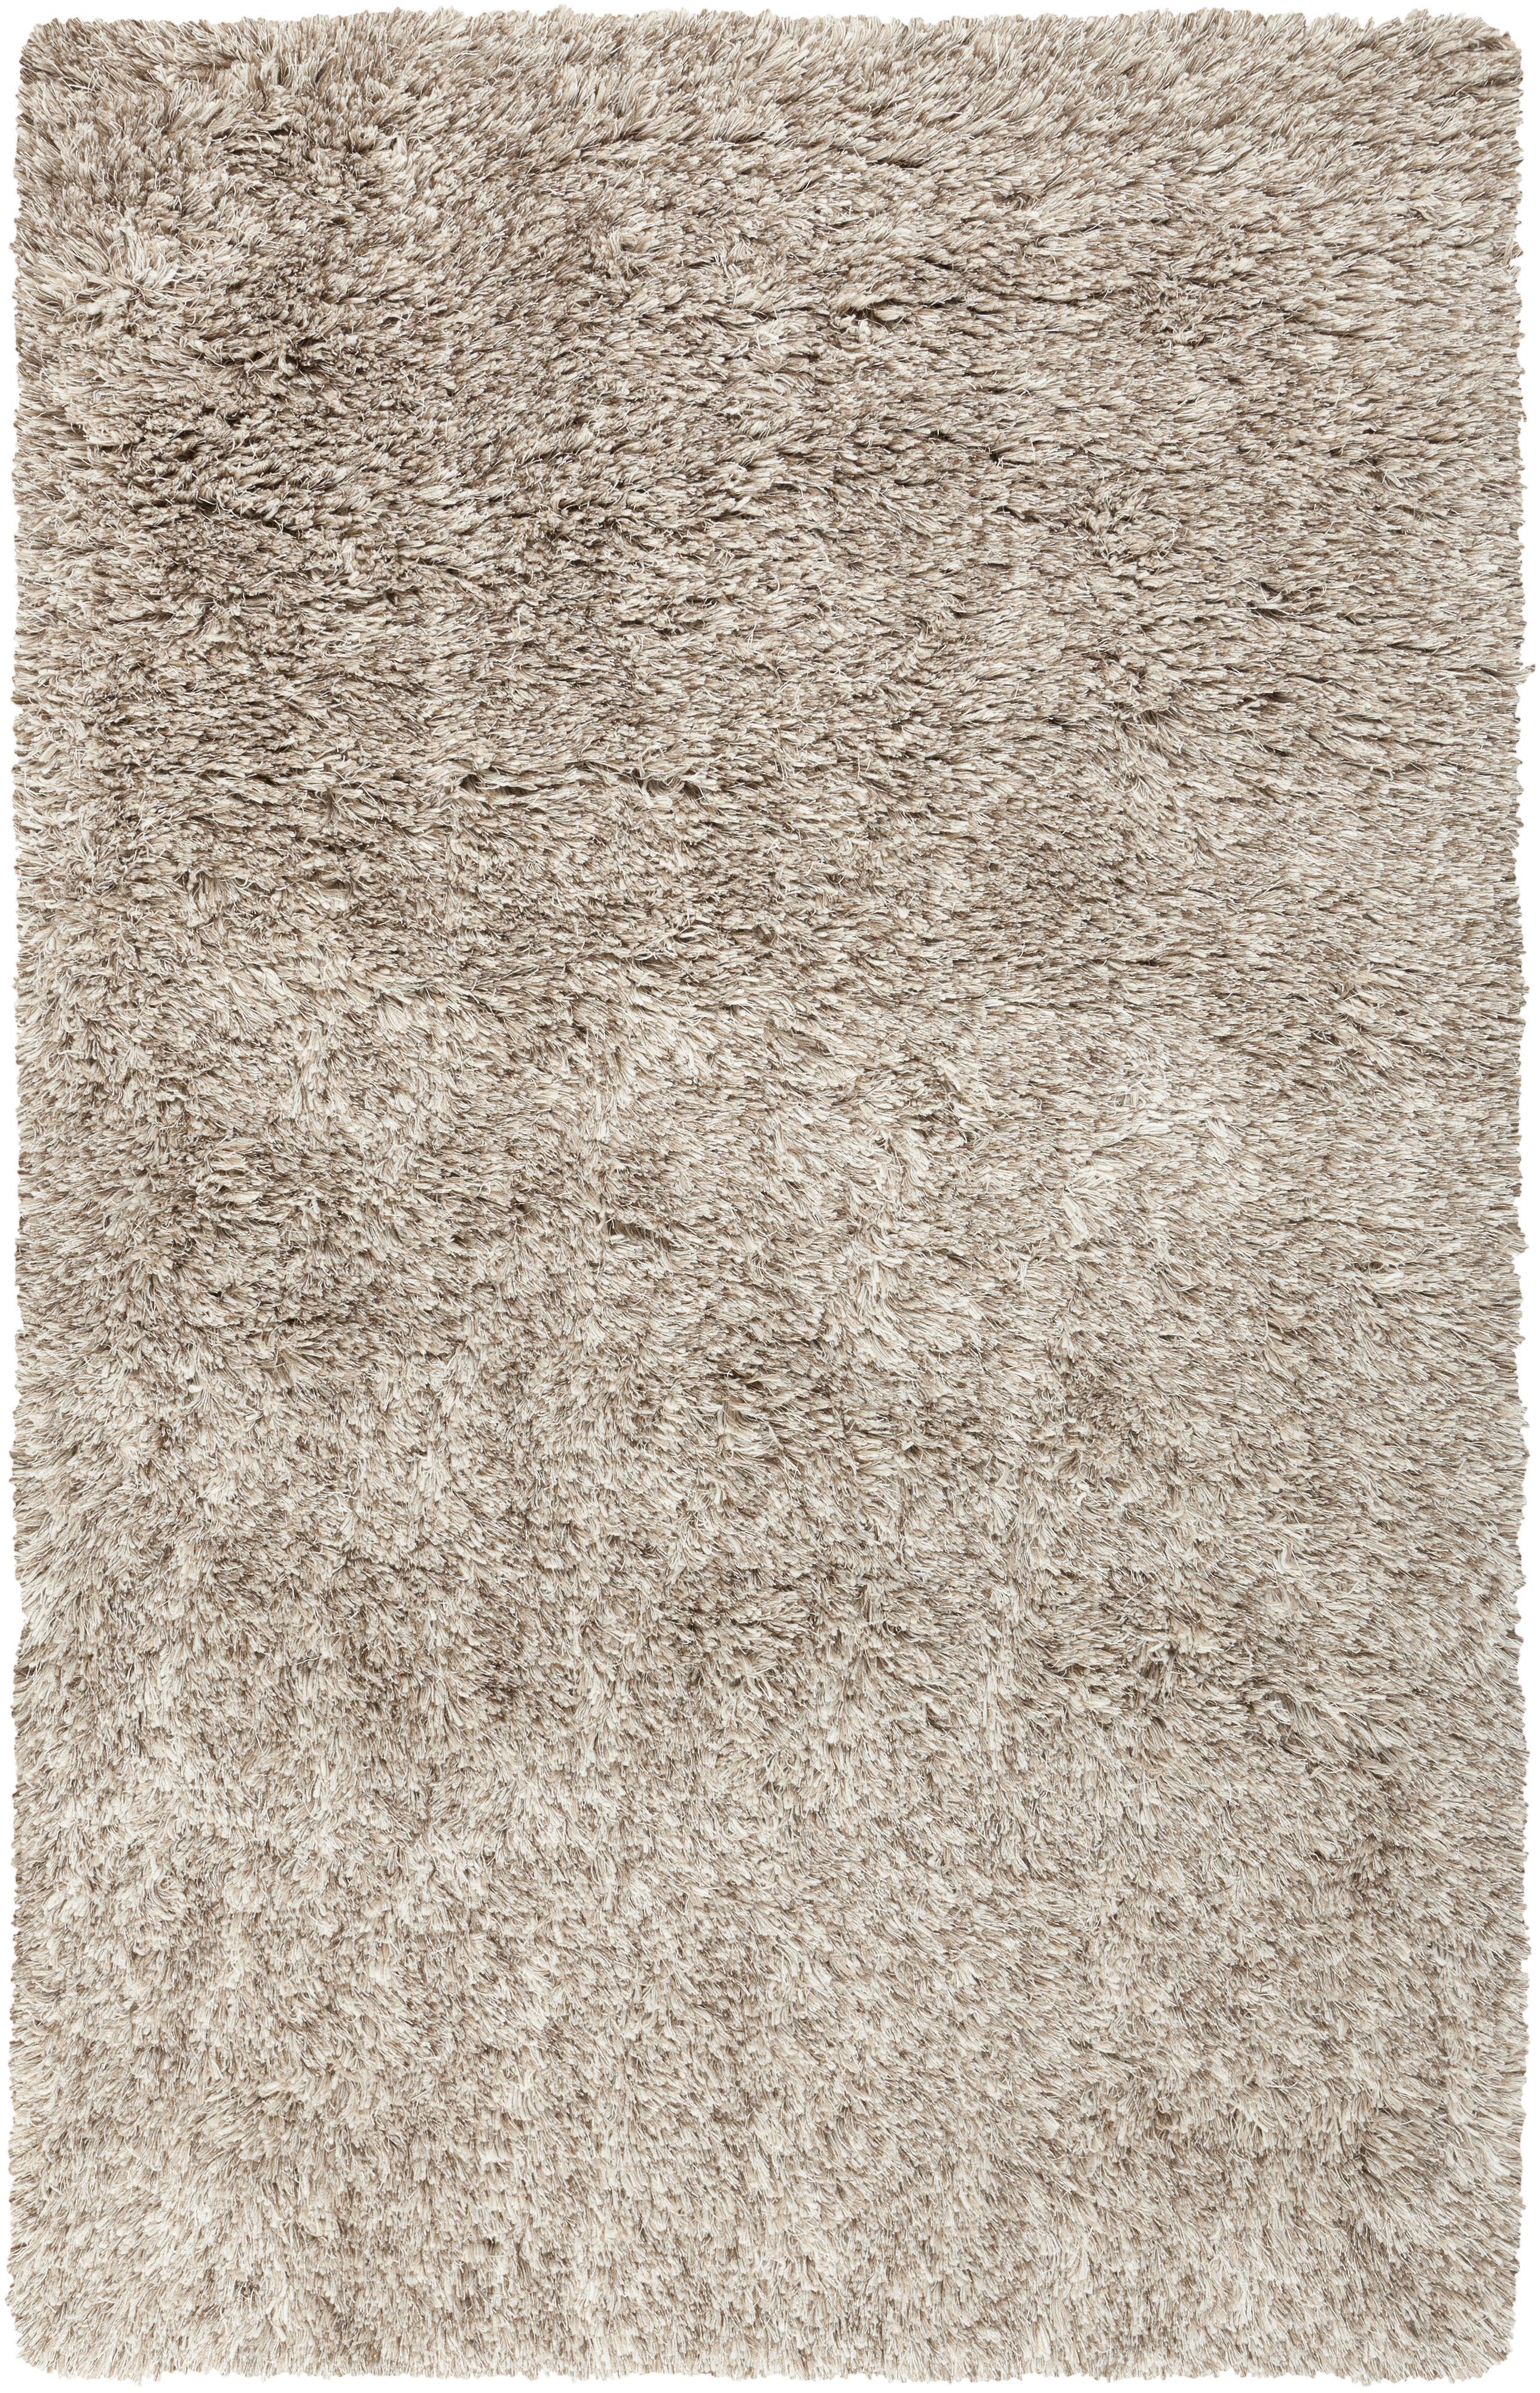 Surya Rugs Milan 2' x 3' - Item Number: MIL5001-23